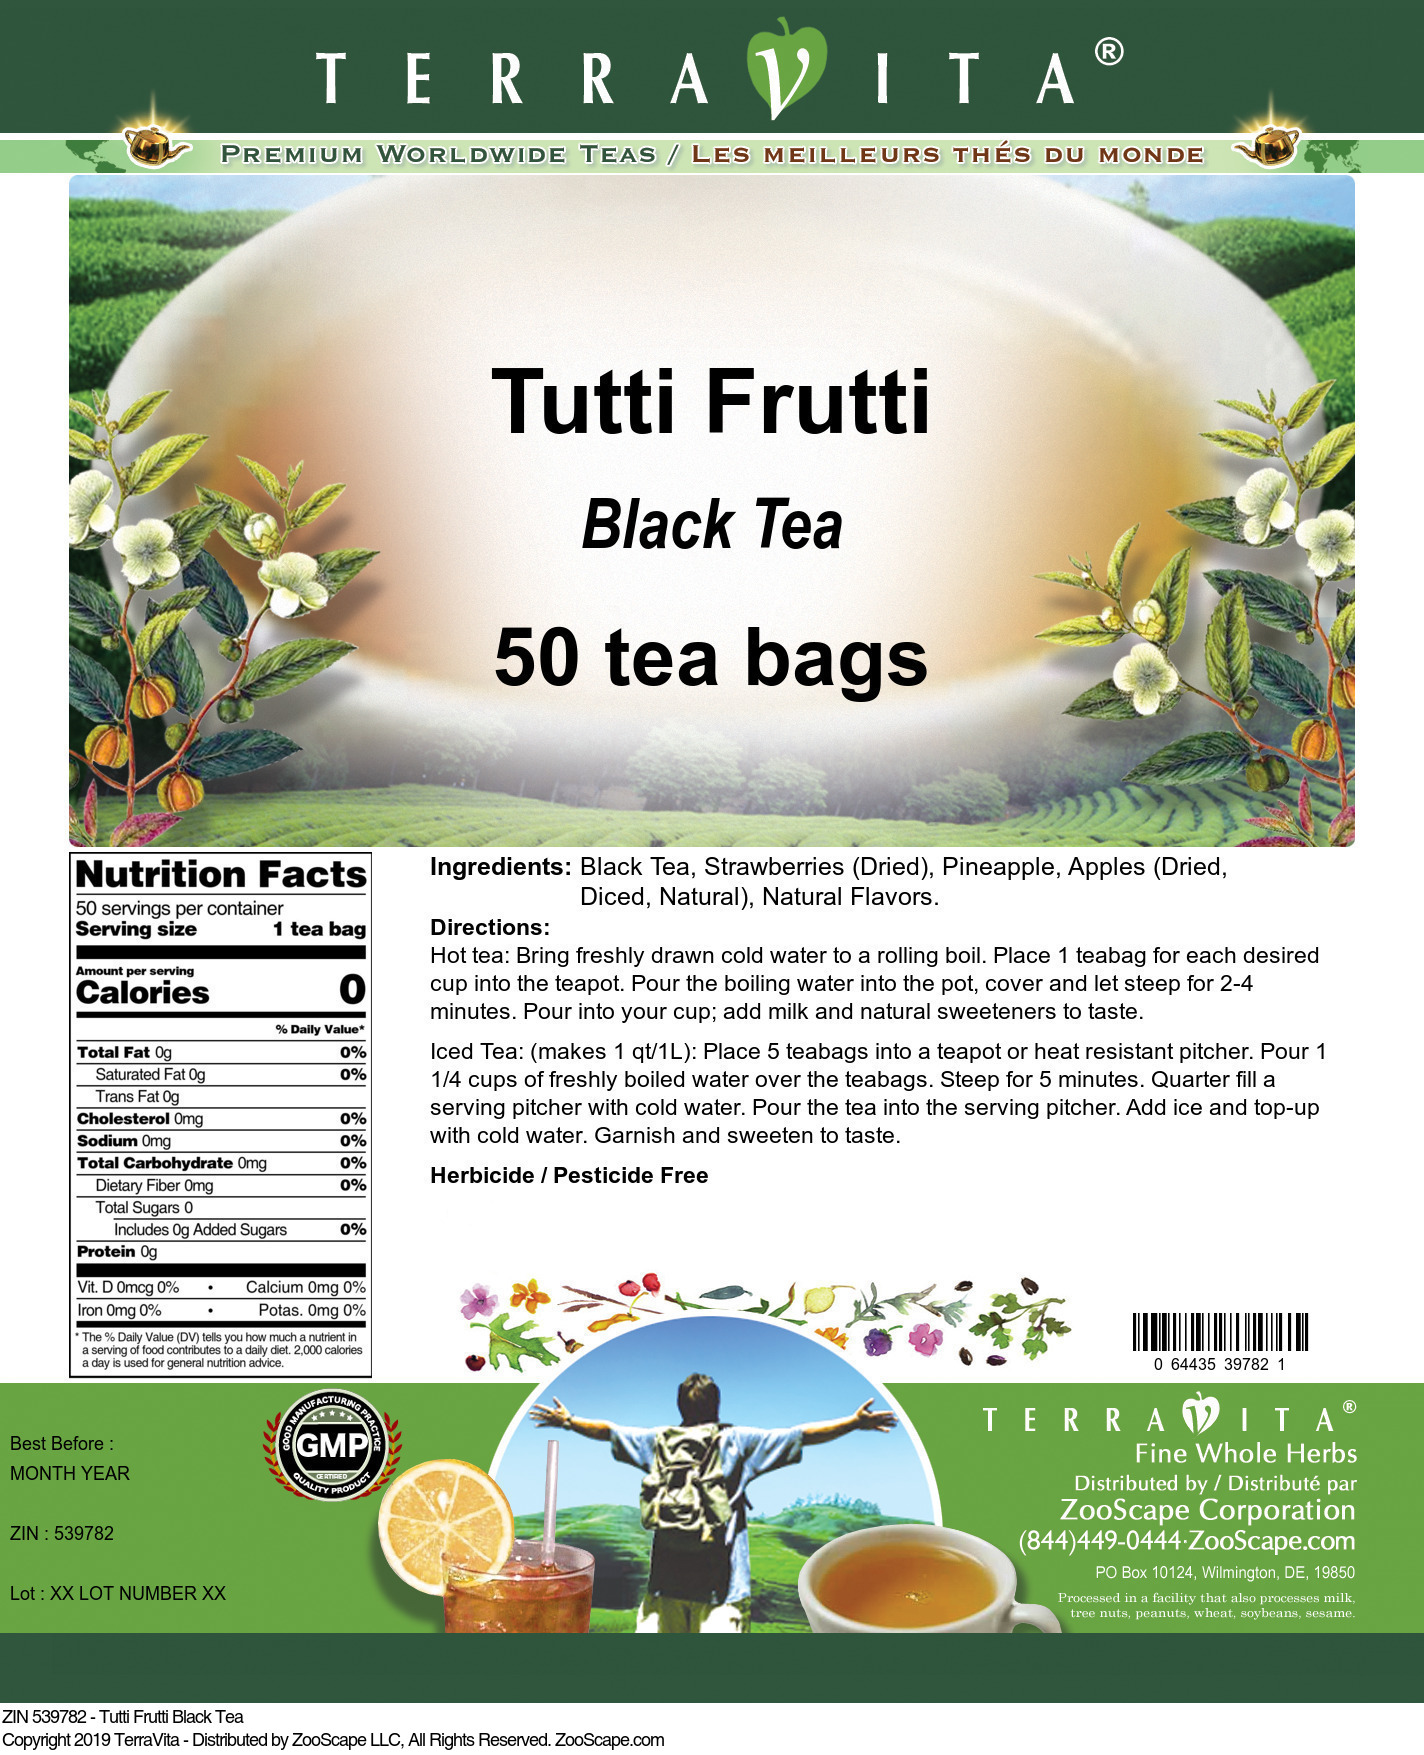 Tutti Frutti Black Tea